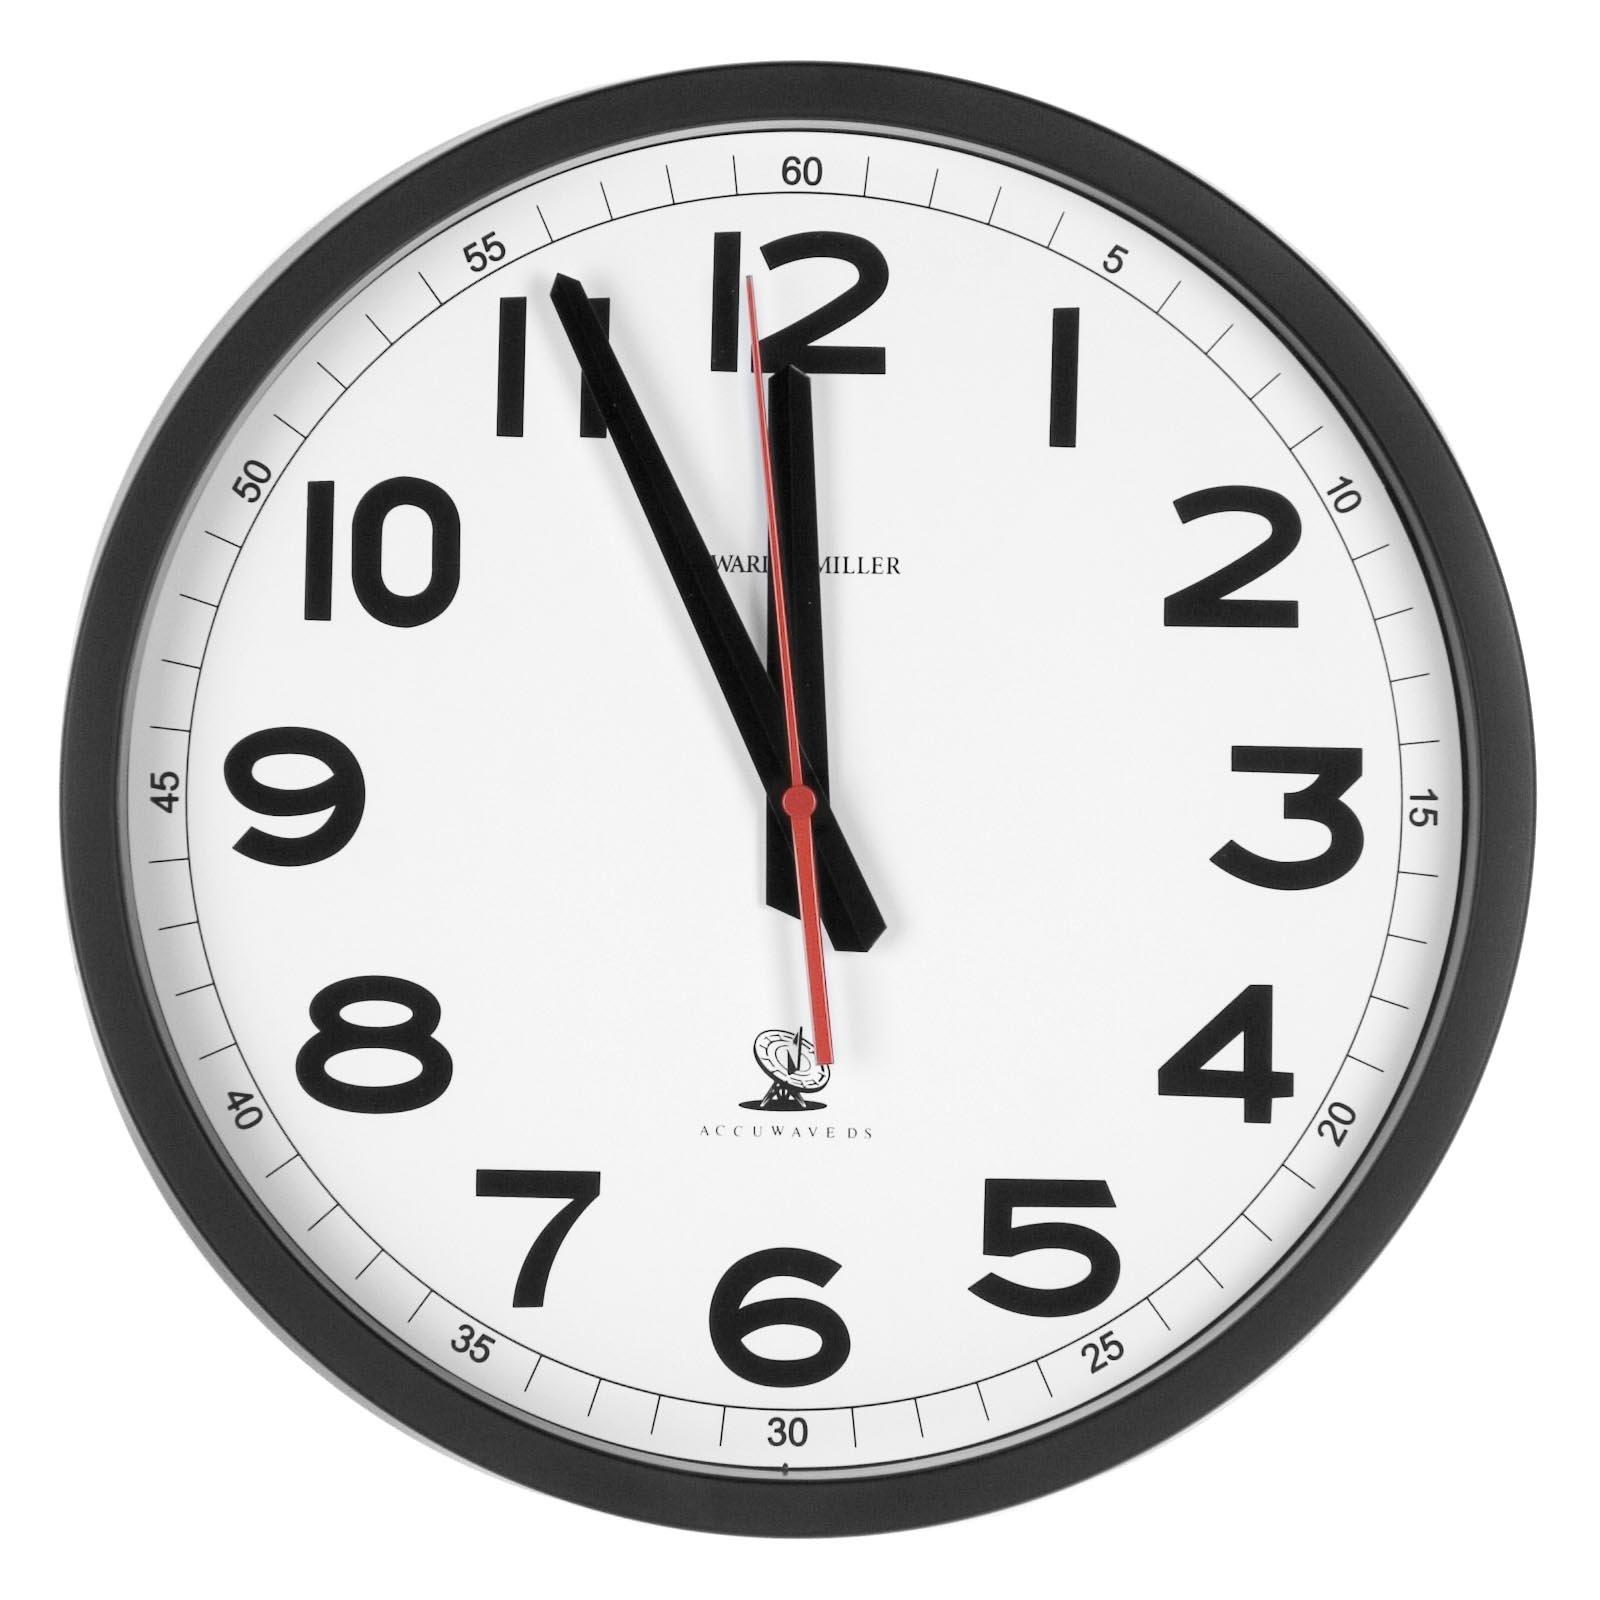 1600x1600 Wall Clock By Hillllallll